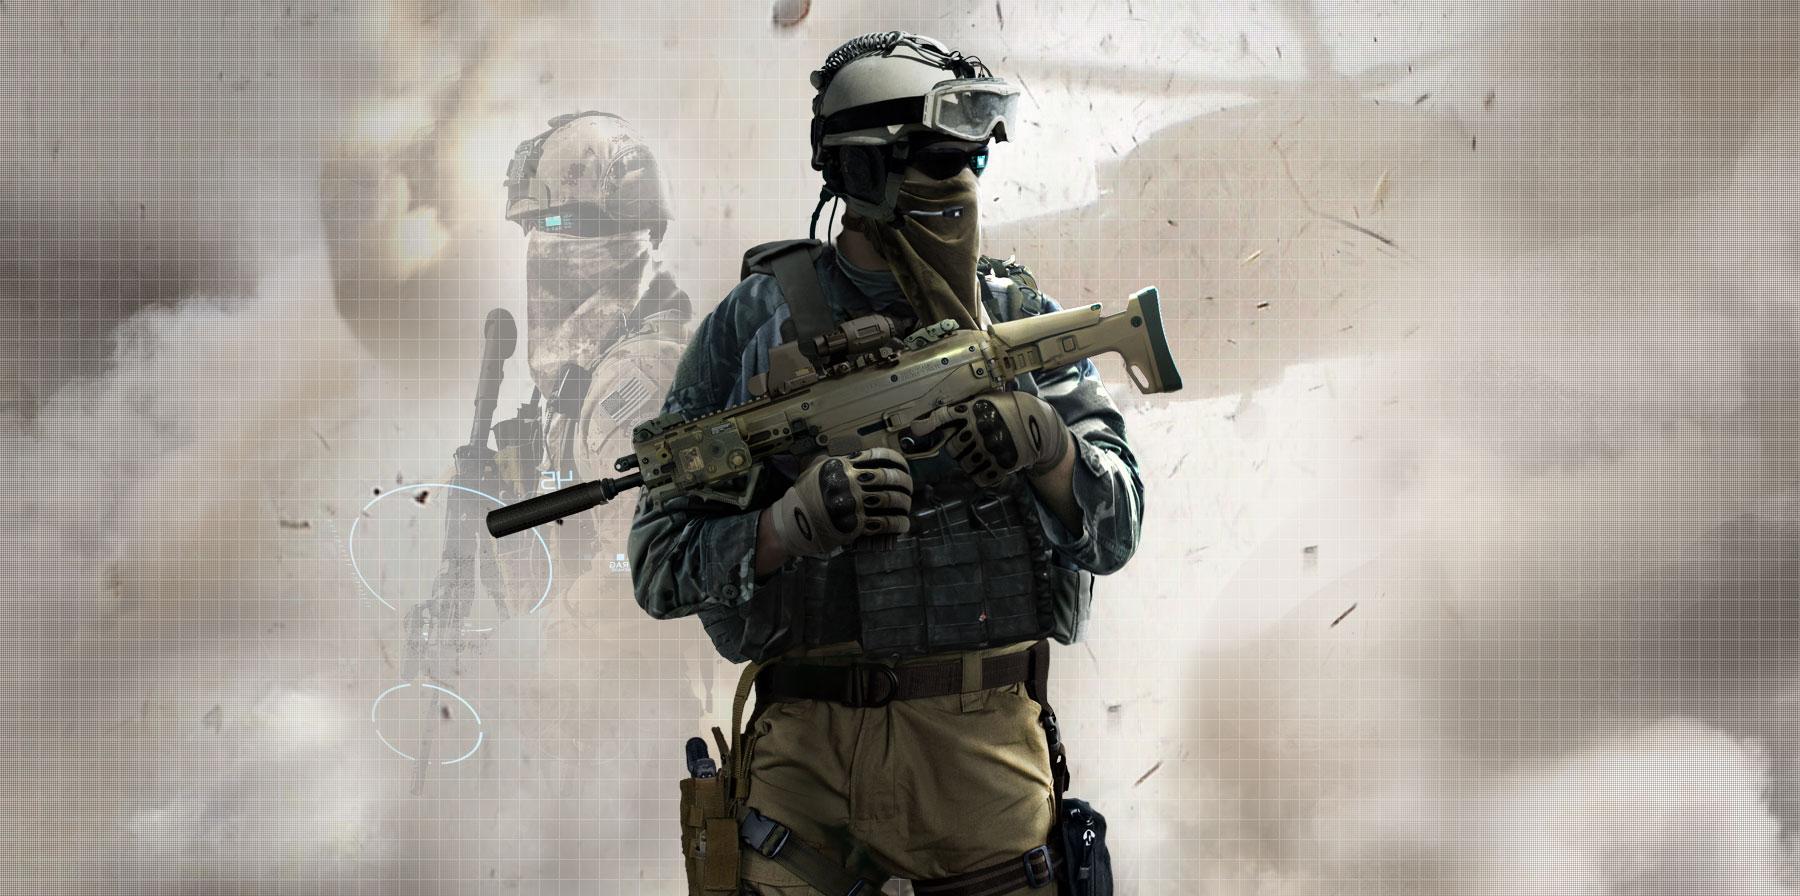 Ghost Recon Future Soldier - ゴーストリコン フューチャーソルジャー | トップページ | Ubisoft